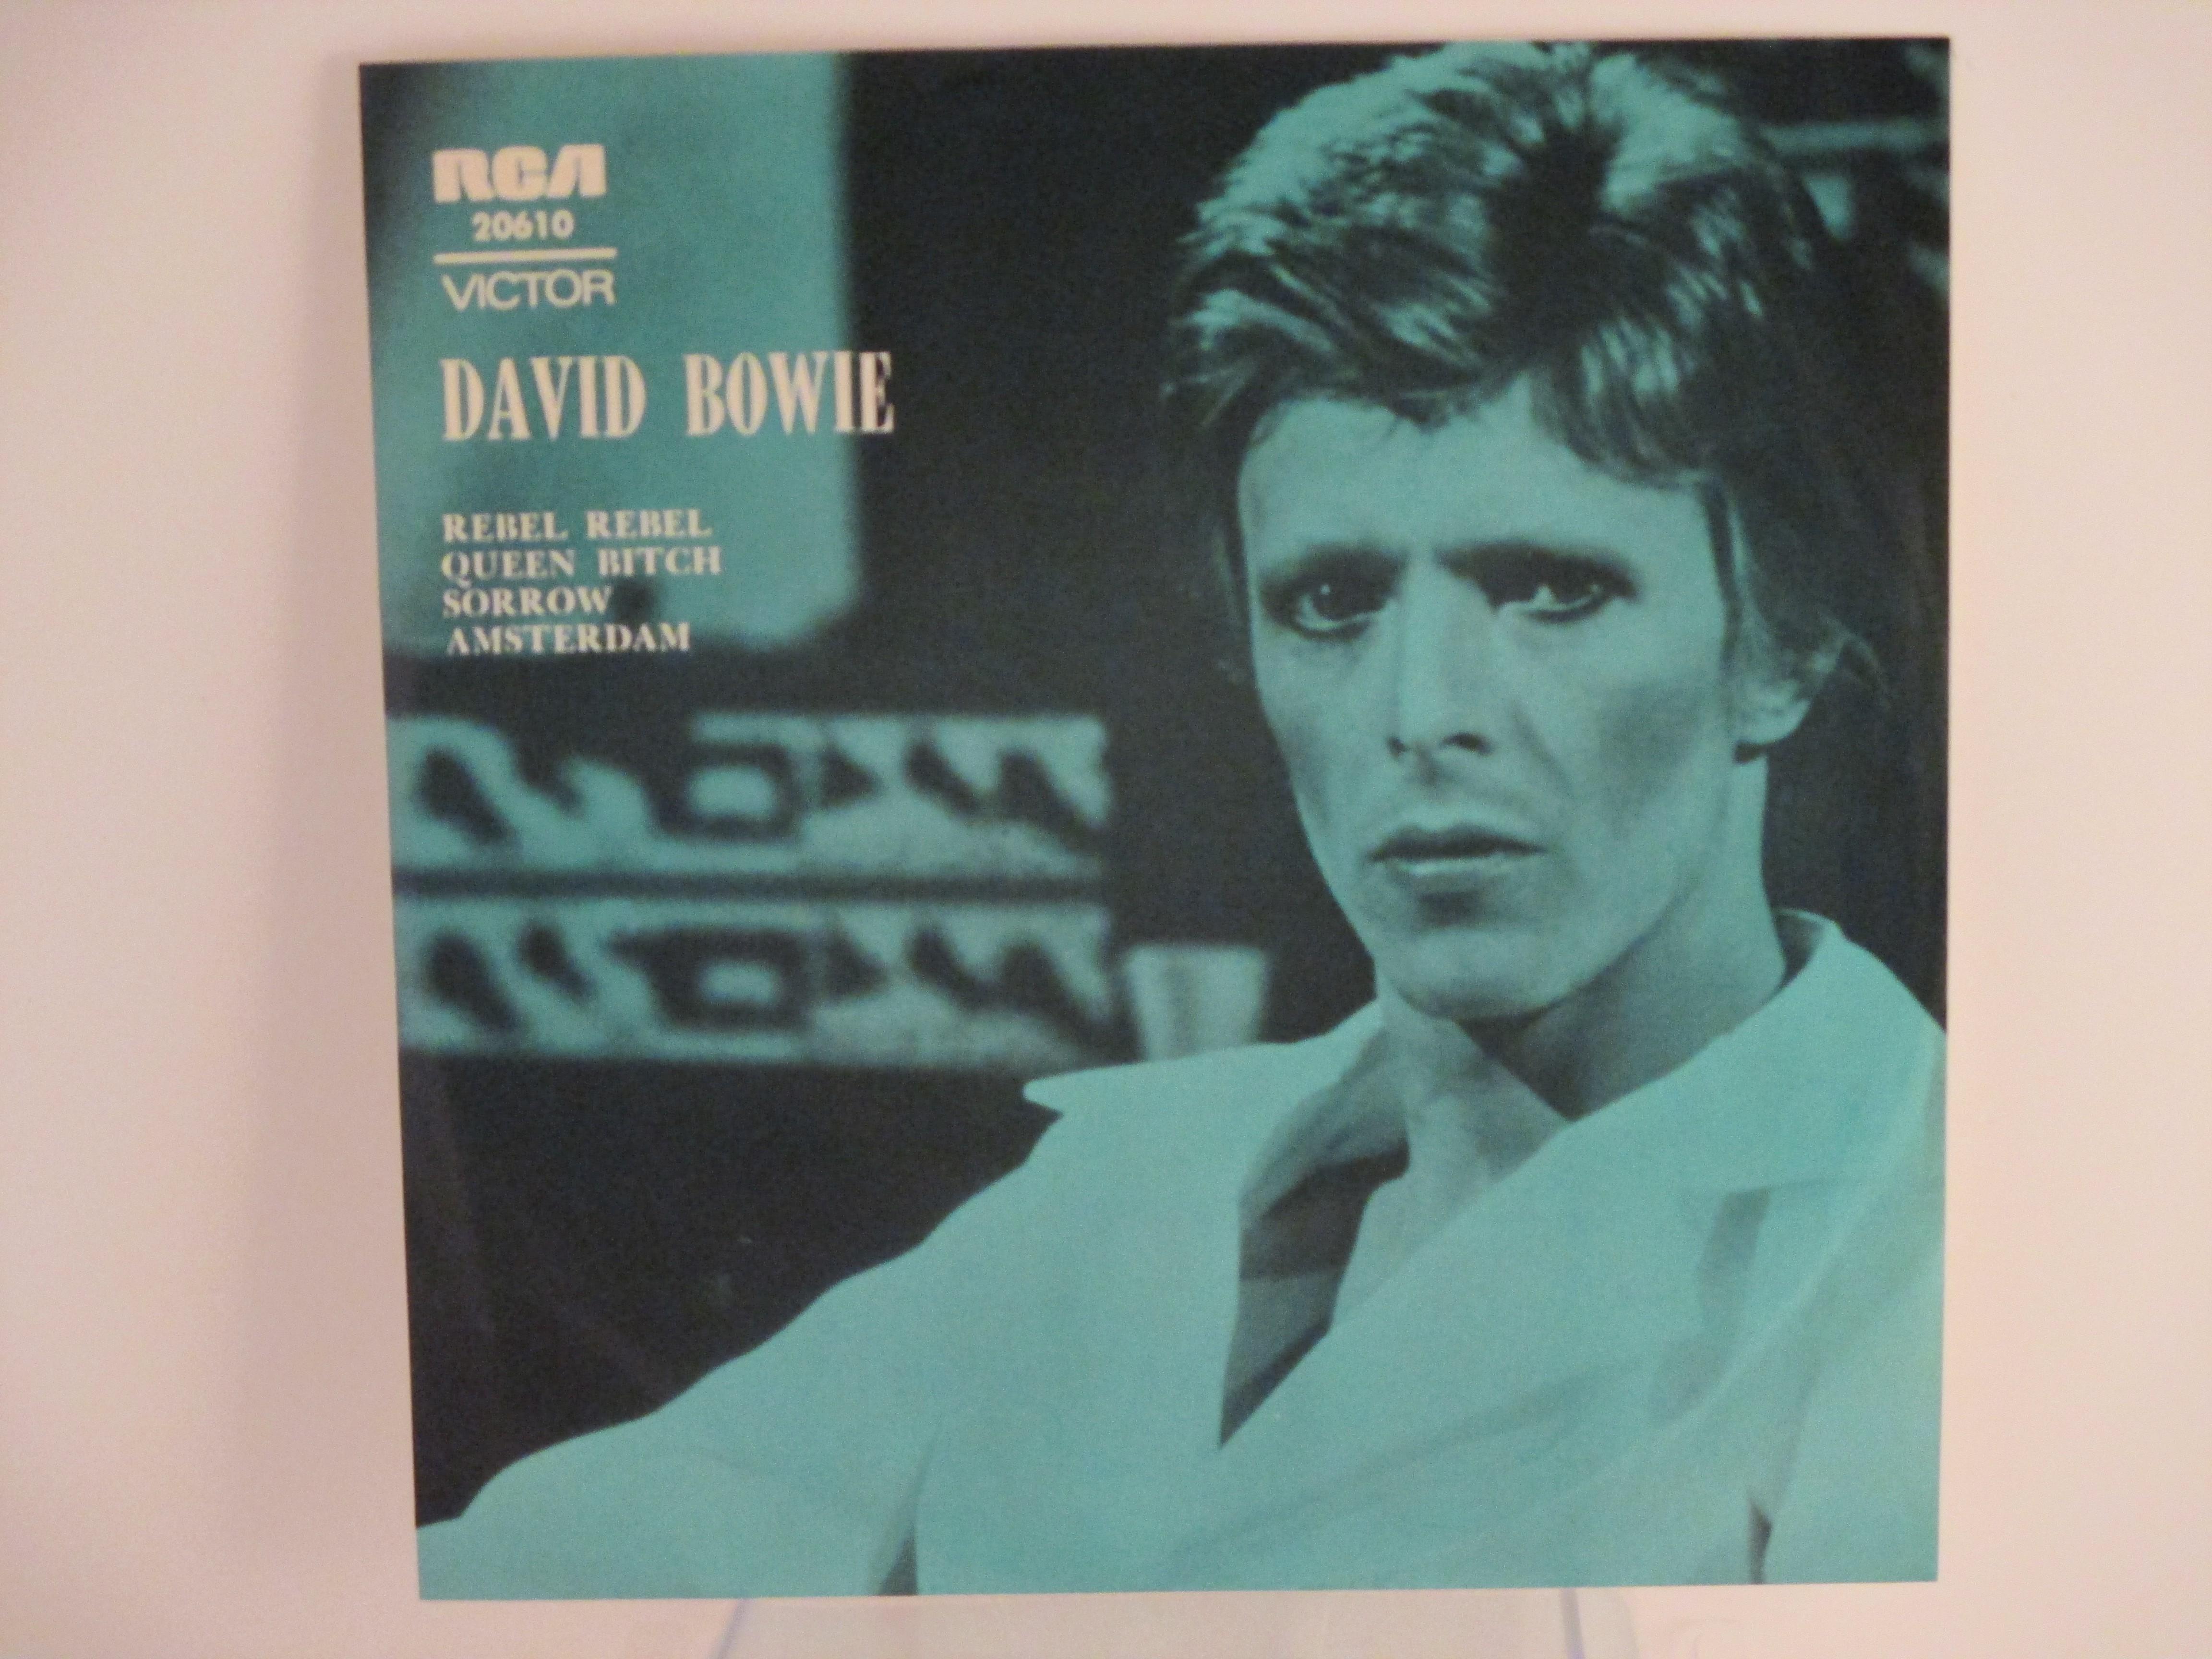 DAVID BOWIE : (EP) Rebel rebel / Queen Bitch / Sorrow / Amsterdam